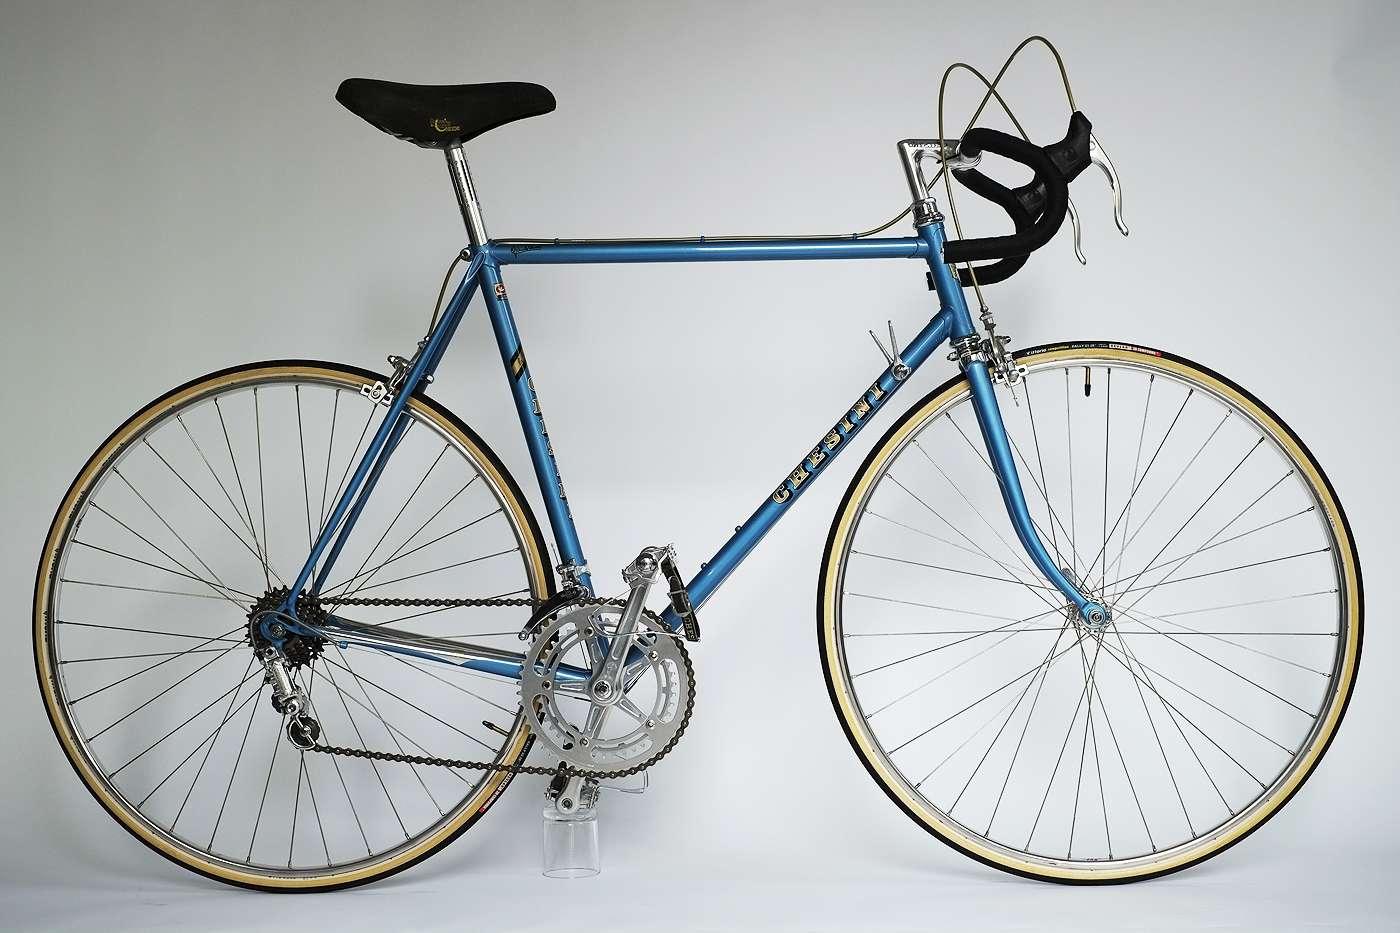 Chesini_Rennrad_Klassik_Bike_01